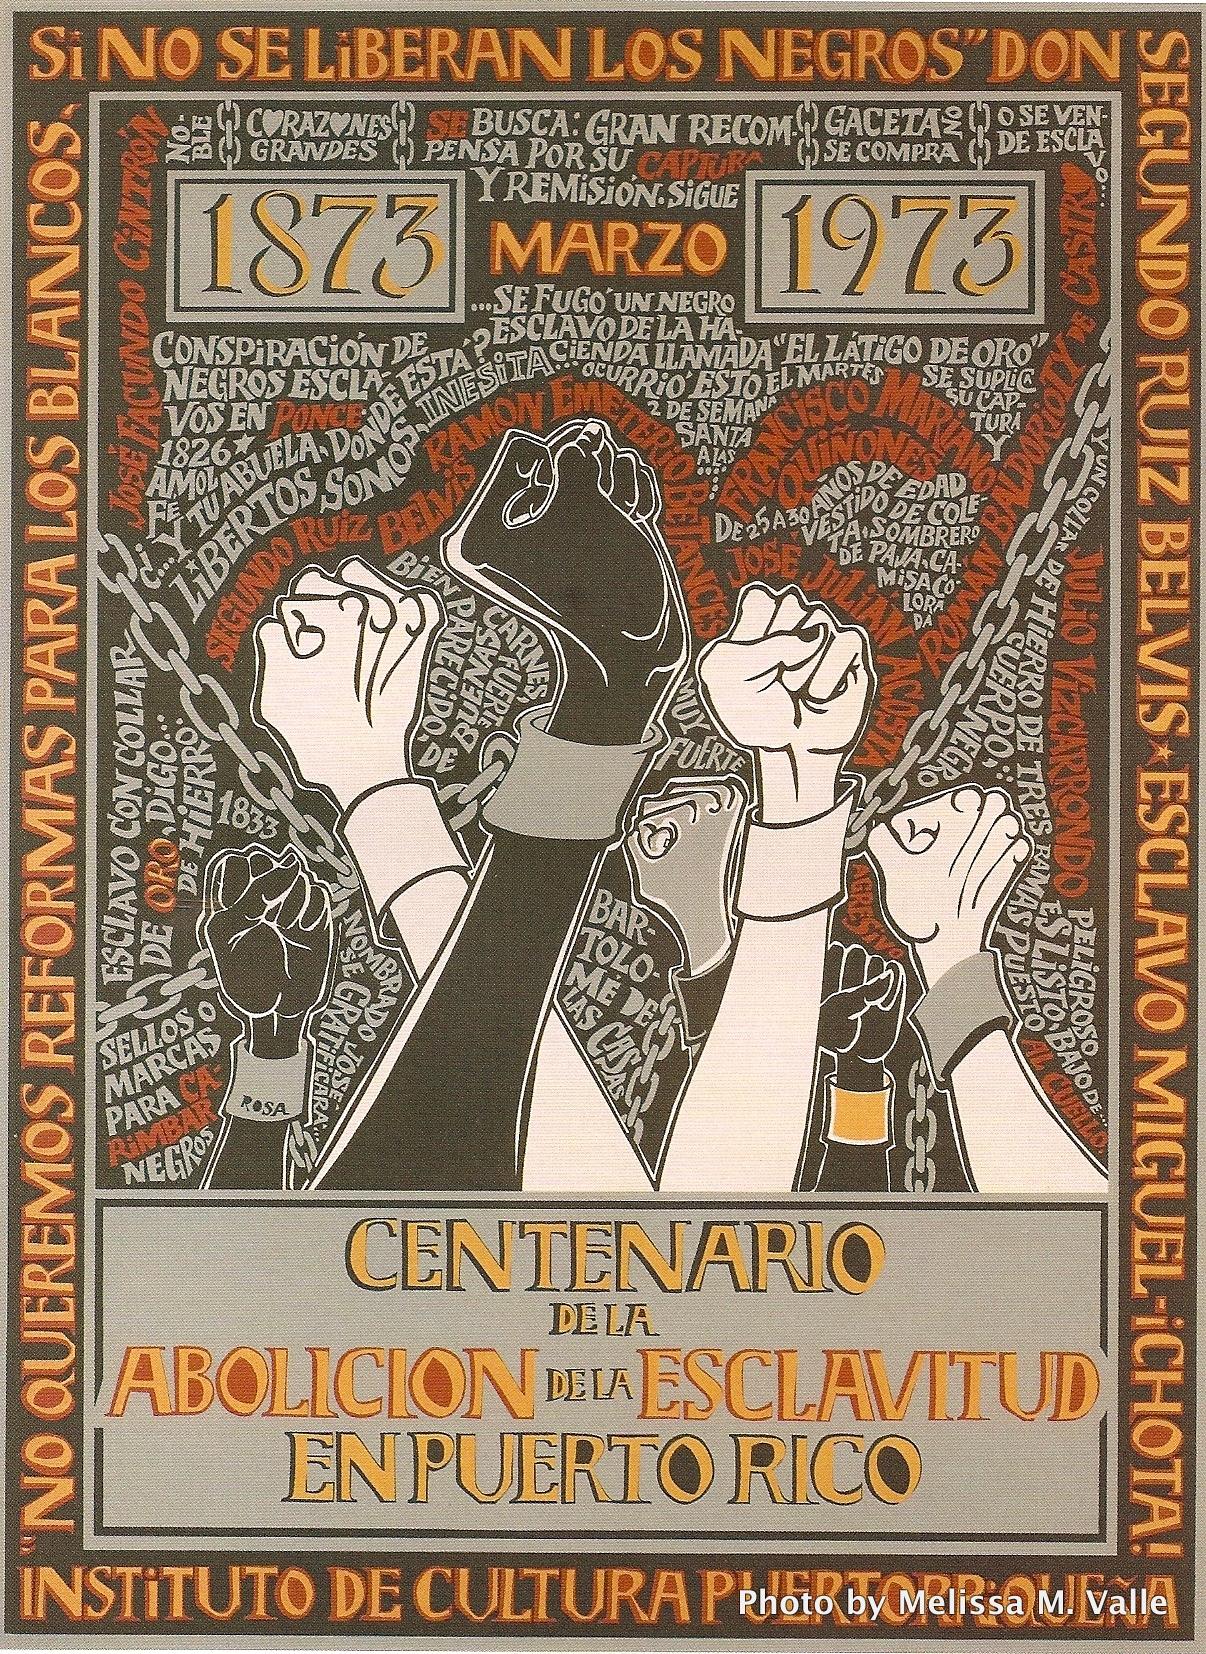 slave abolition in puerto rico serigraph